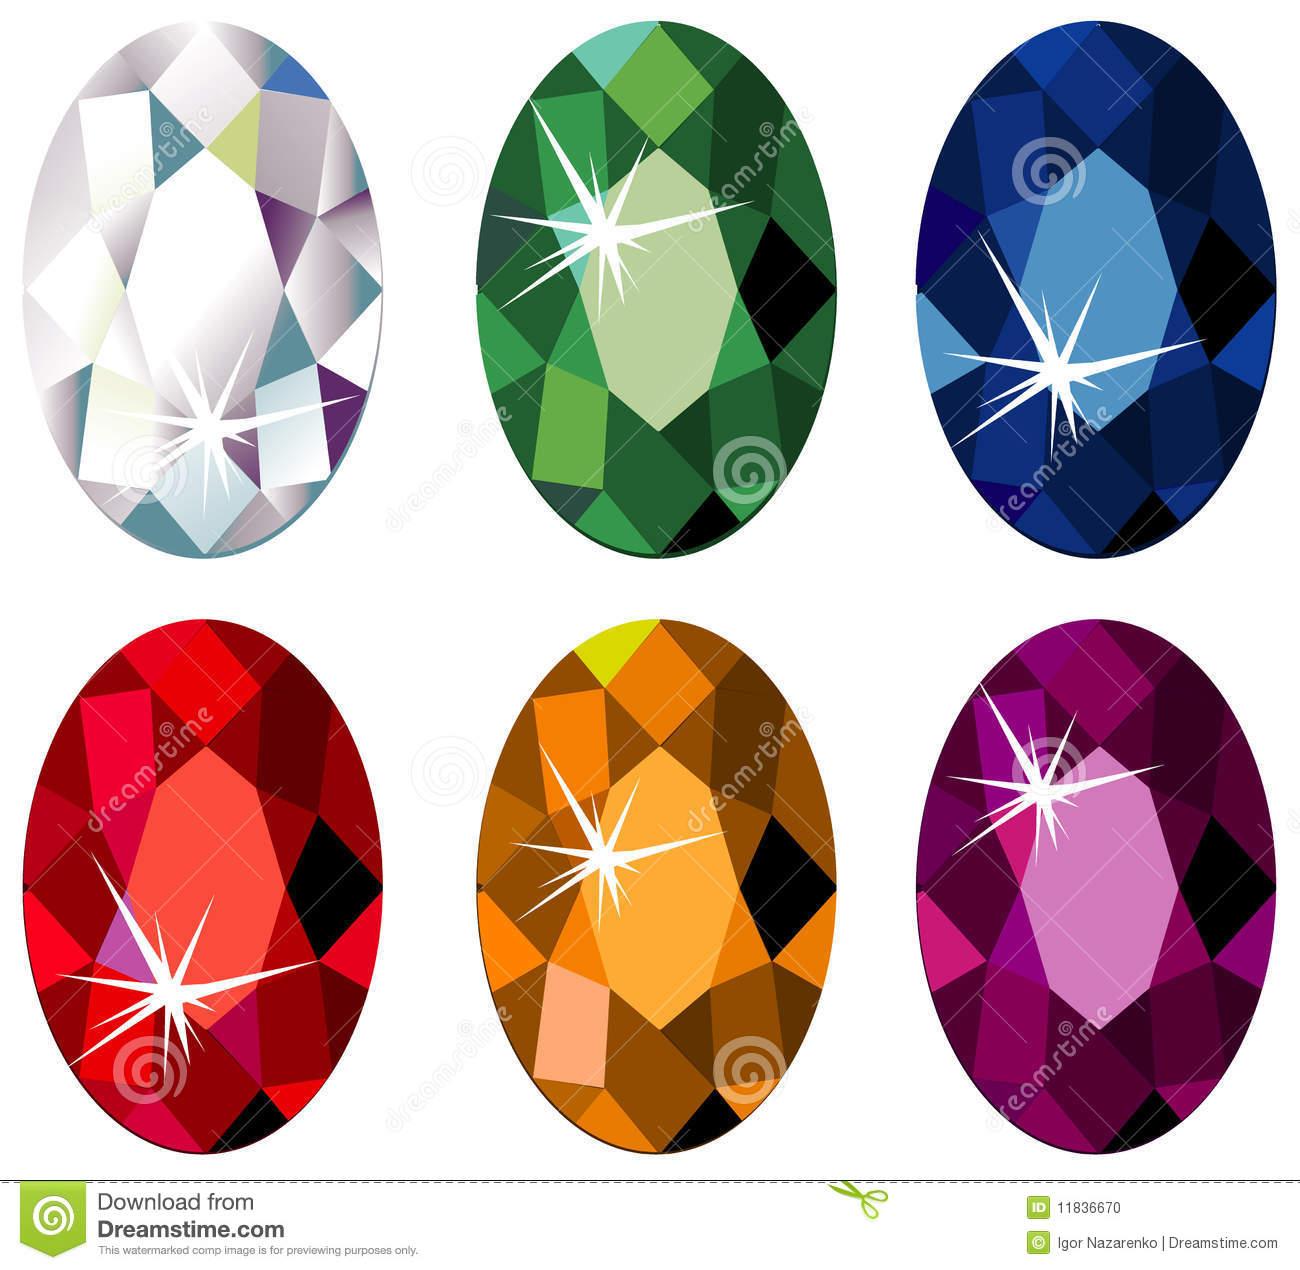 Diamond Cut Precious Stones With Sparkle Royalty Free Stock Photo.